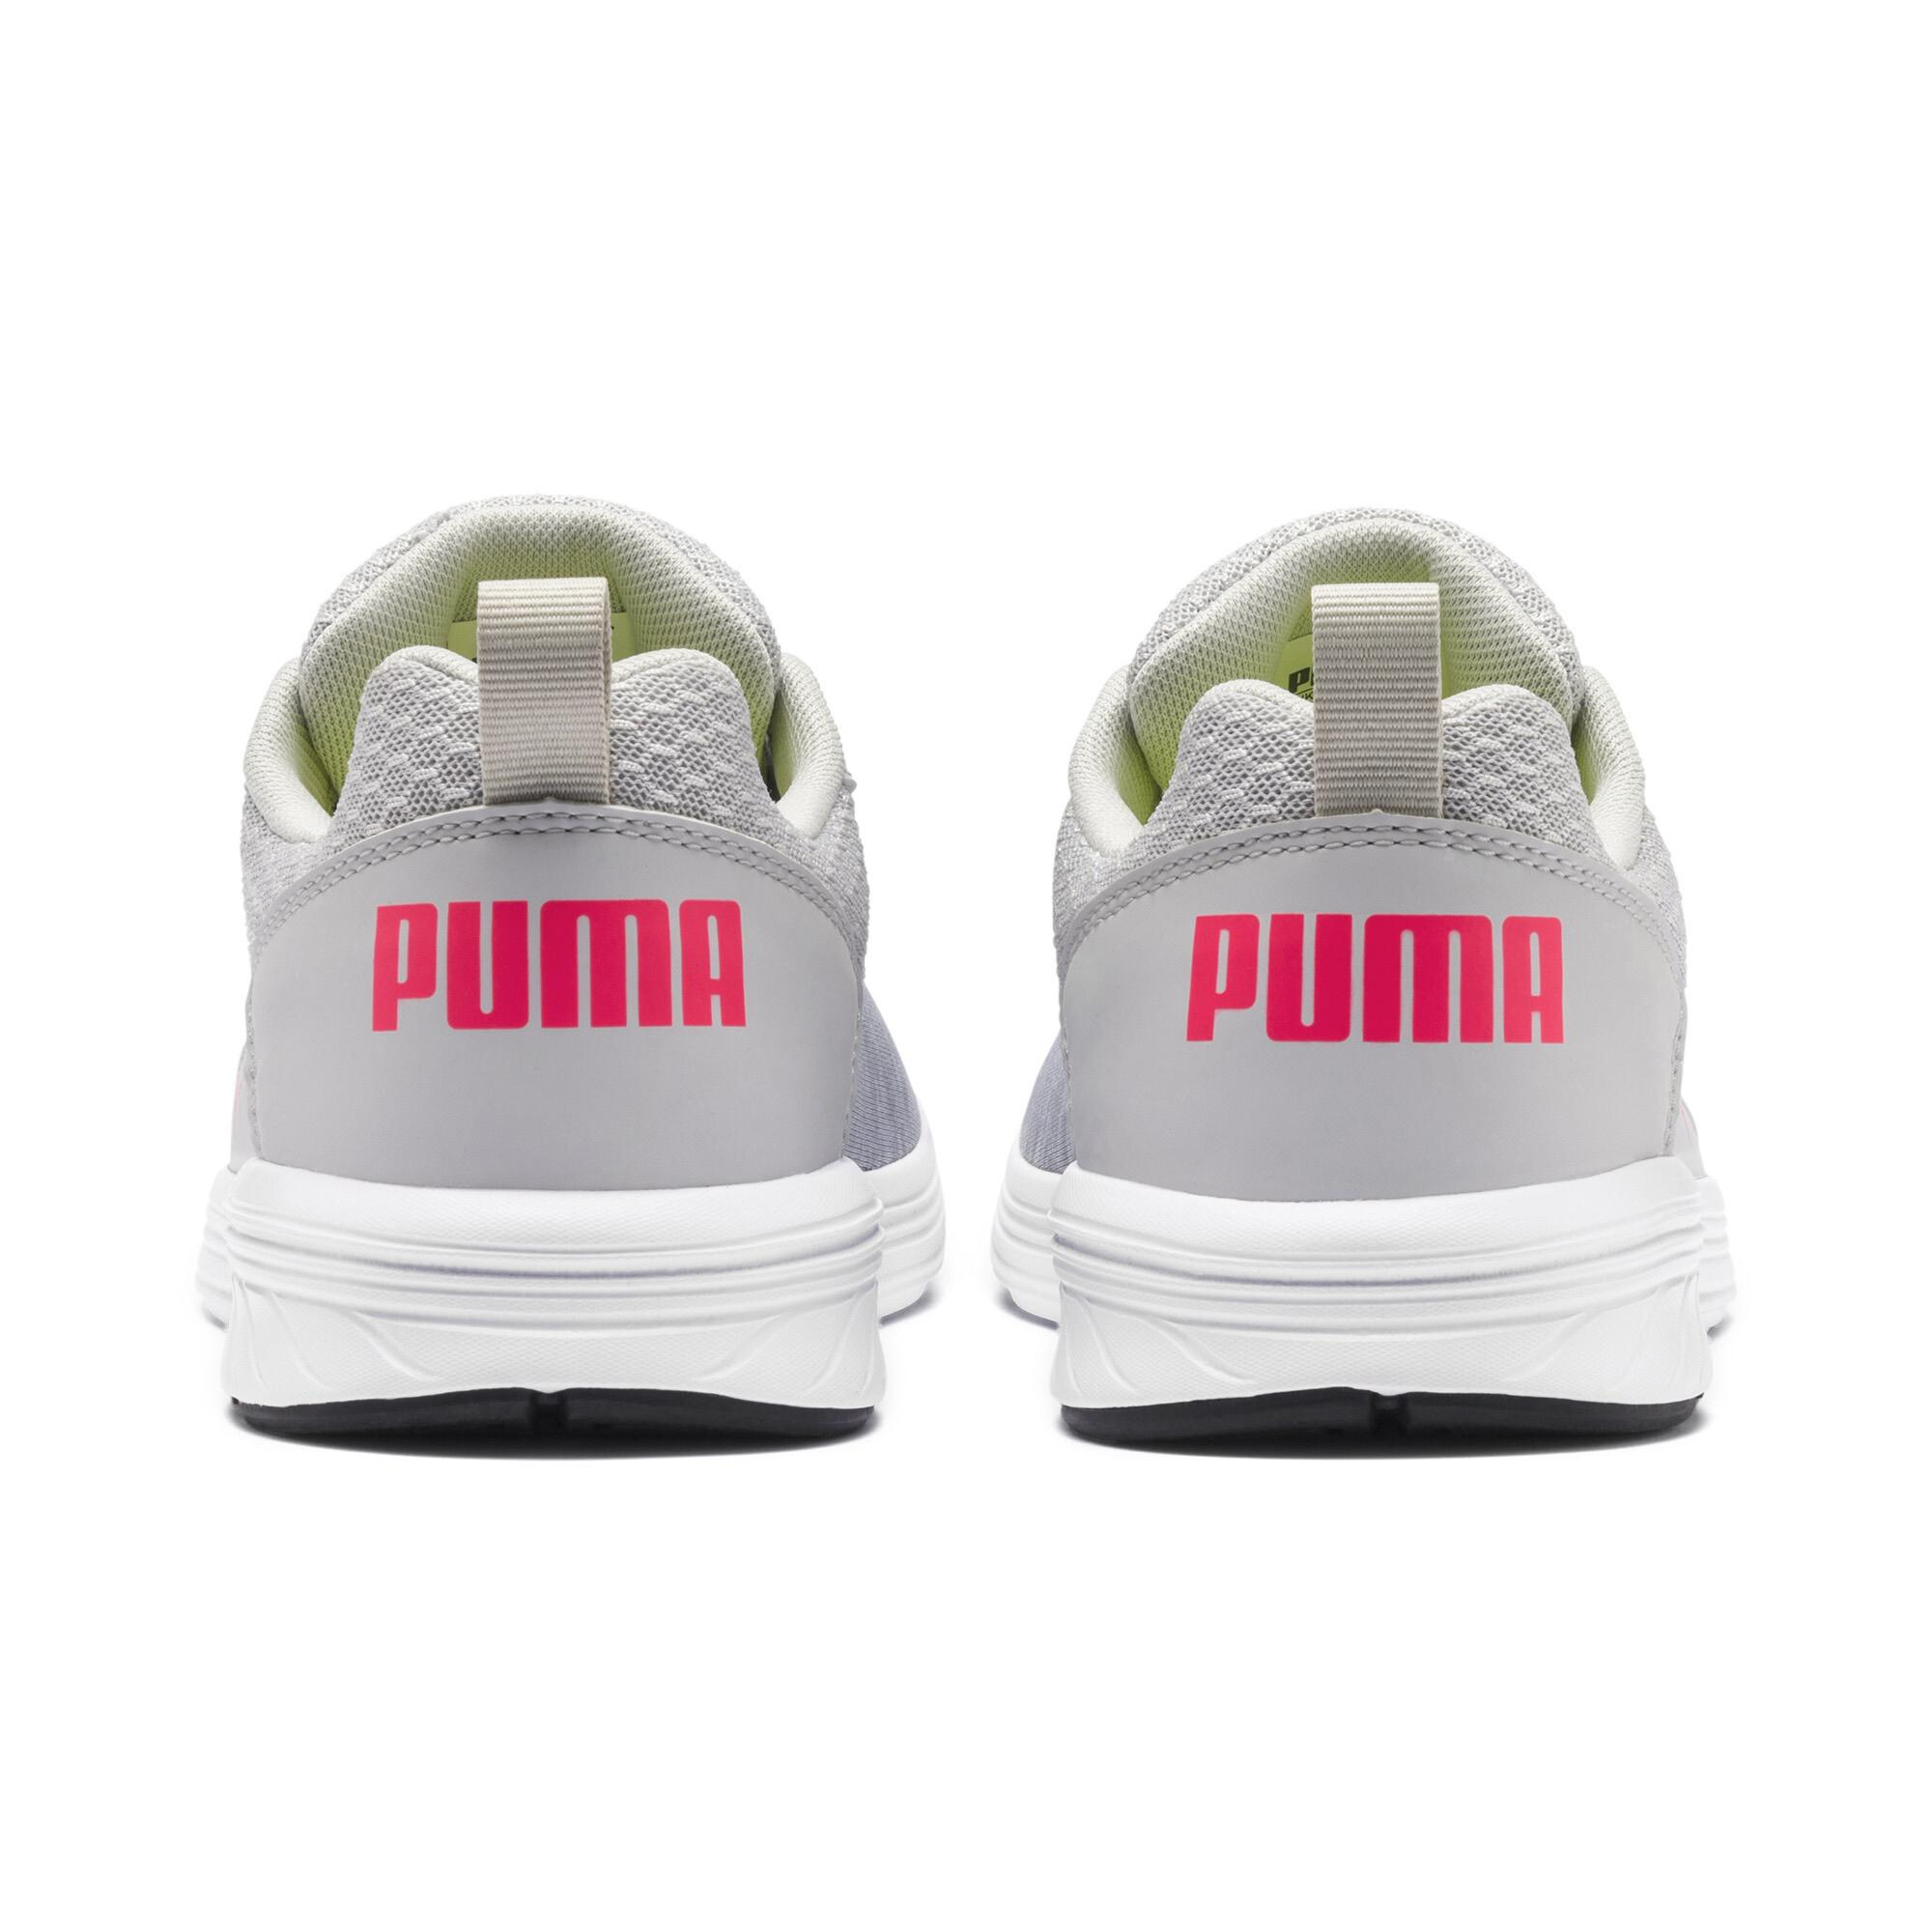 PUMA-NRGY-Comet-Men-039-s-Running-Shoes-Men-Shoe-Running thumbnail 22